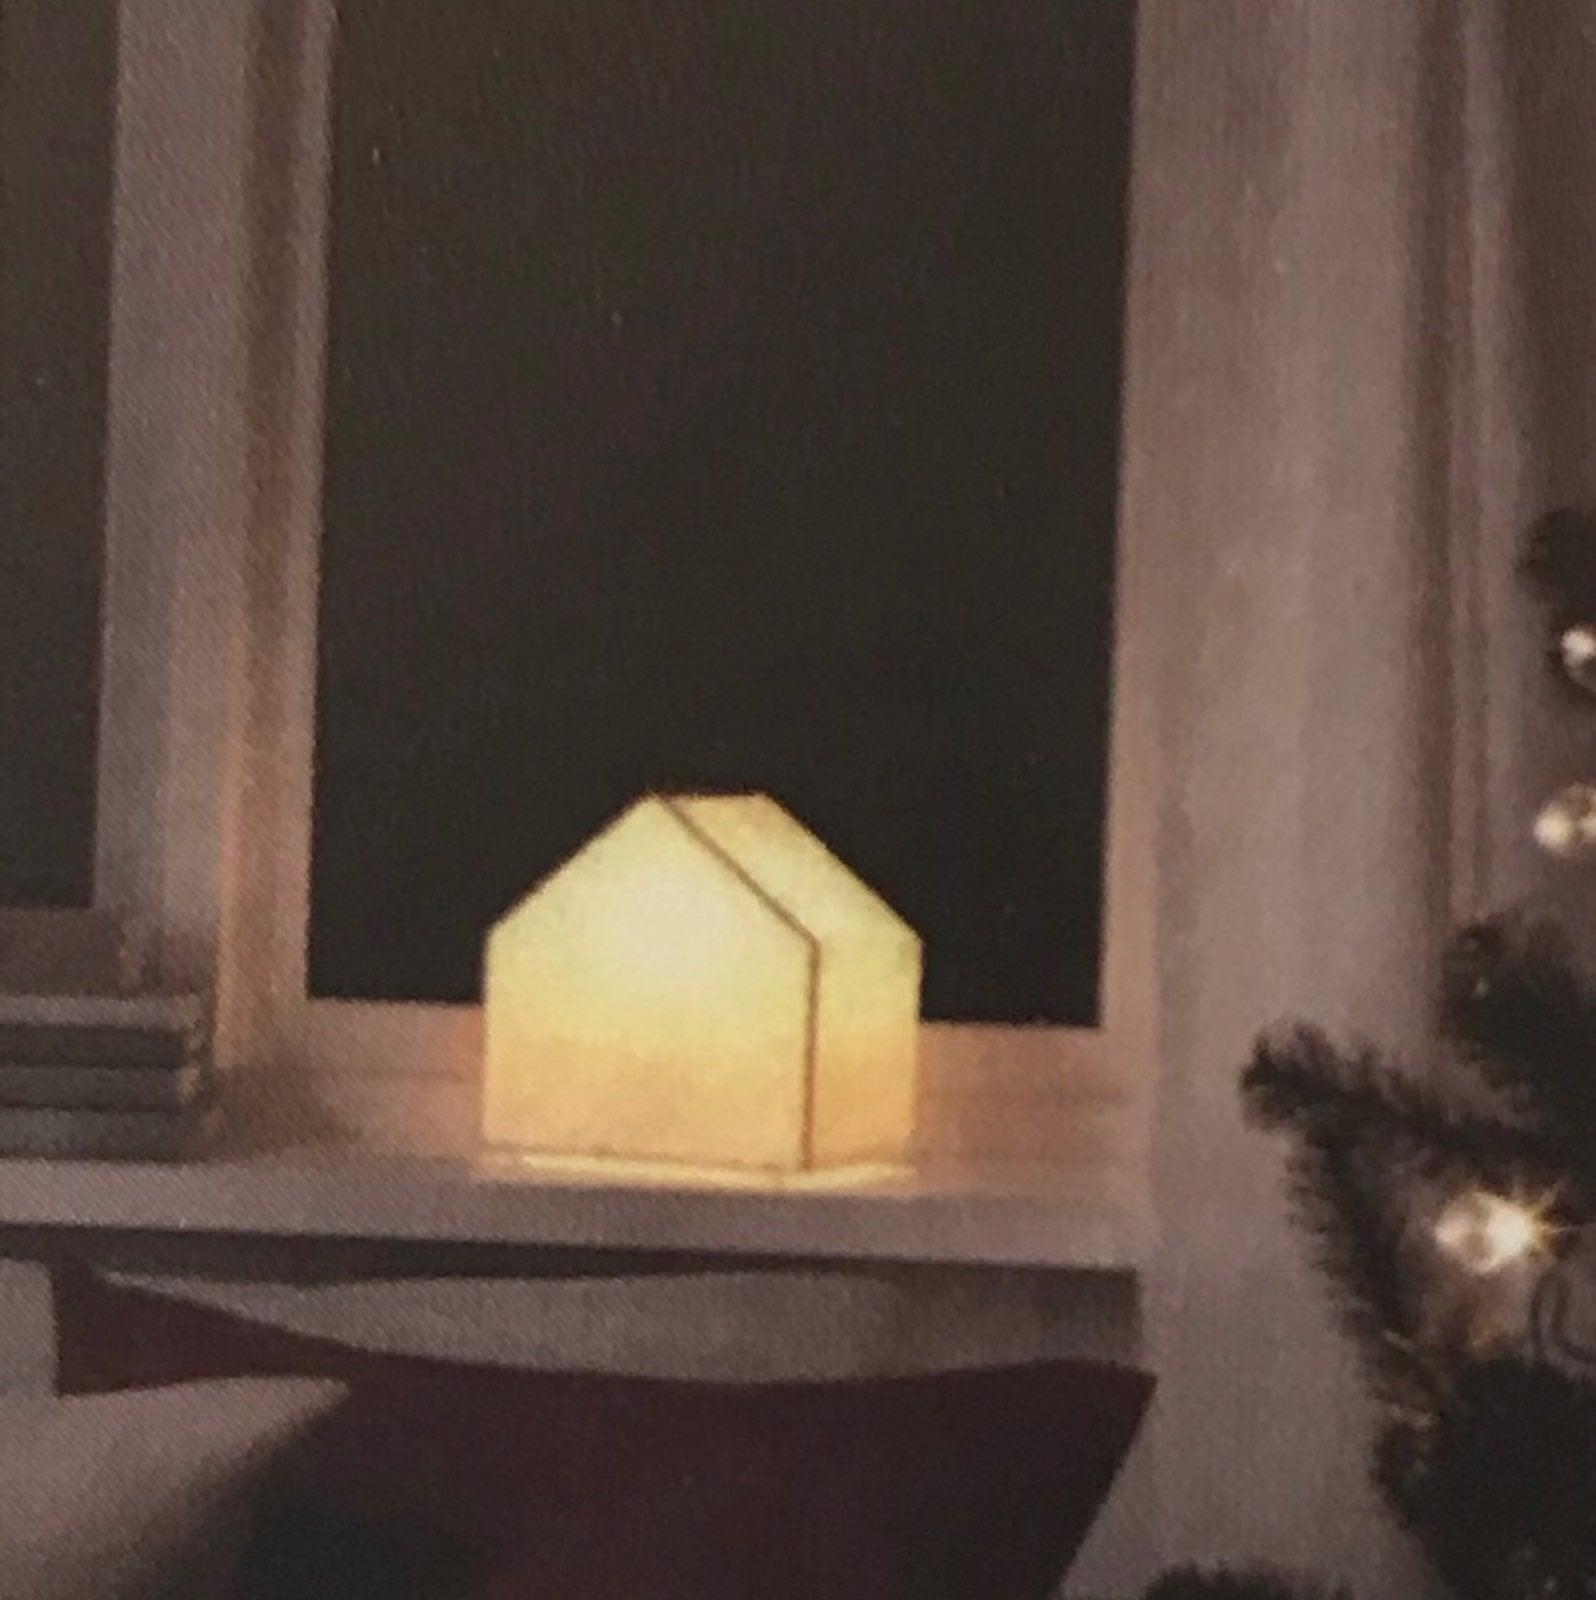 IKEA STRÅLA House Lamp Nightlight